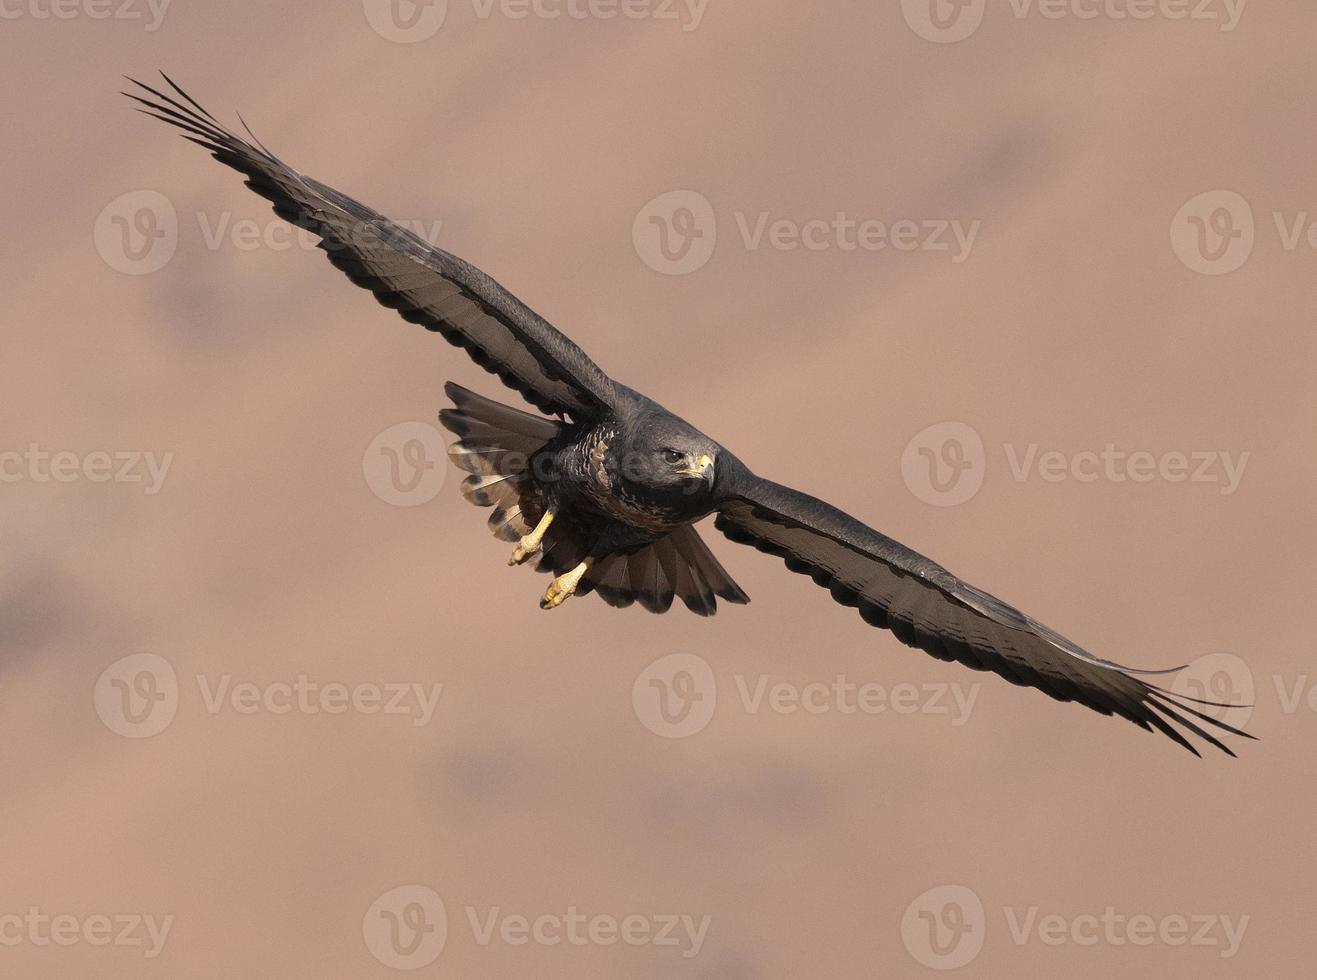 urubu chacal voando foto